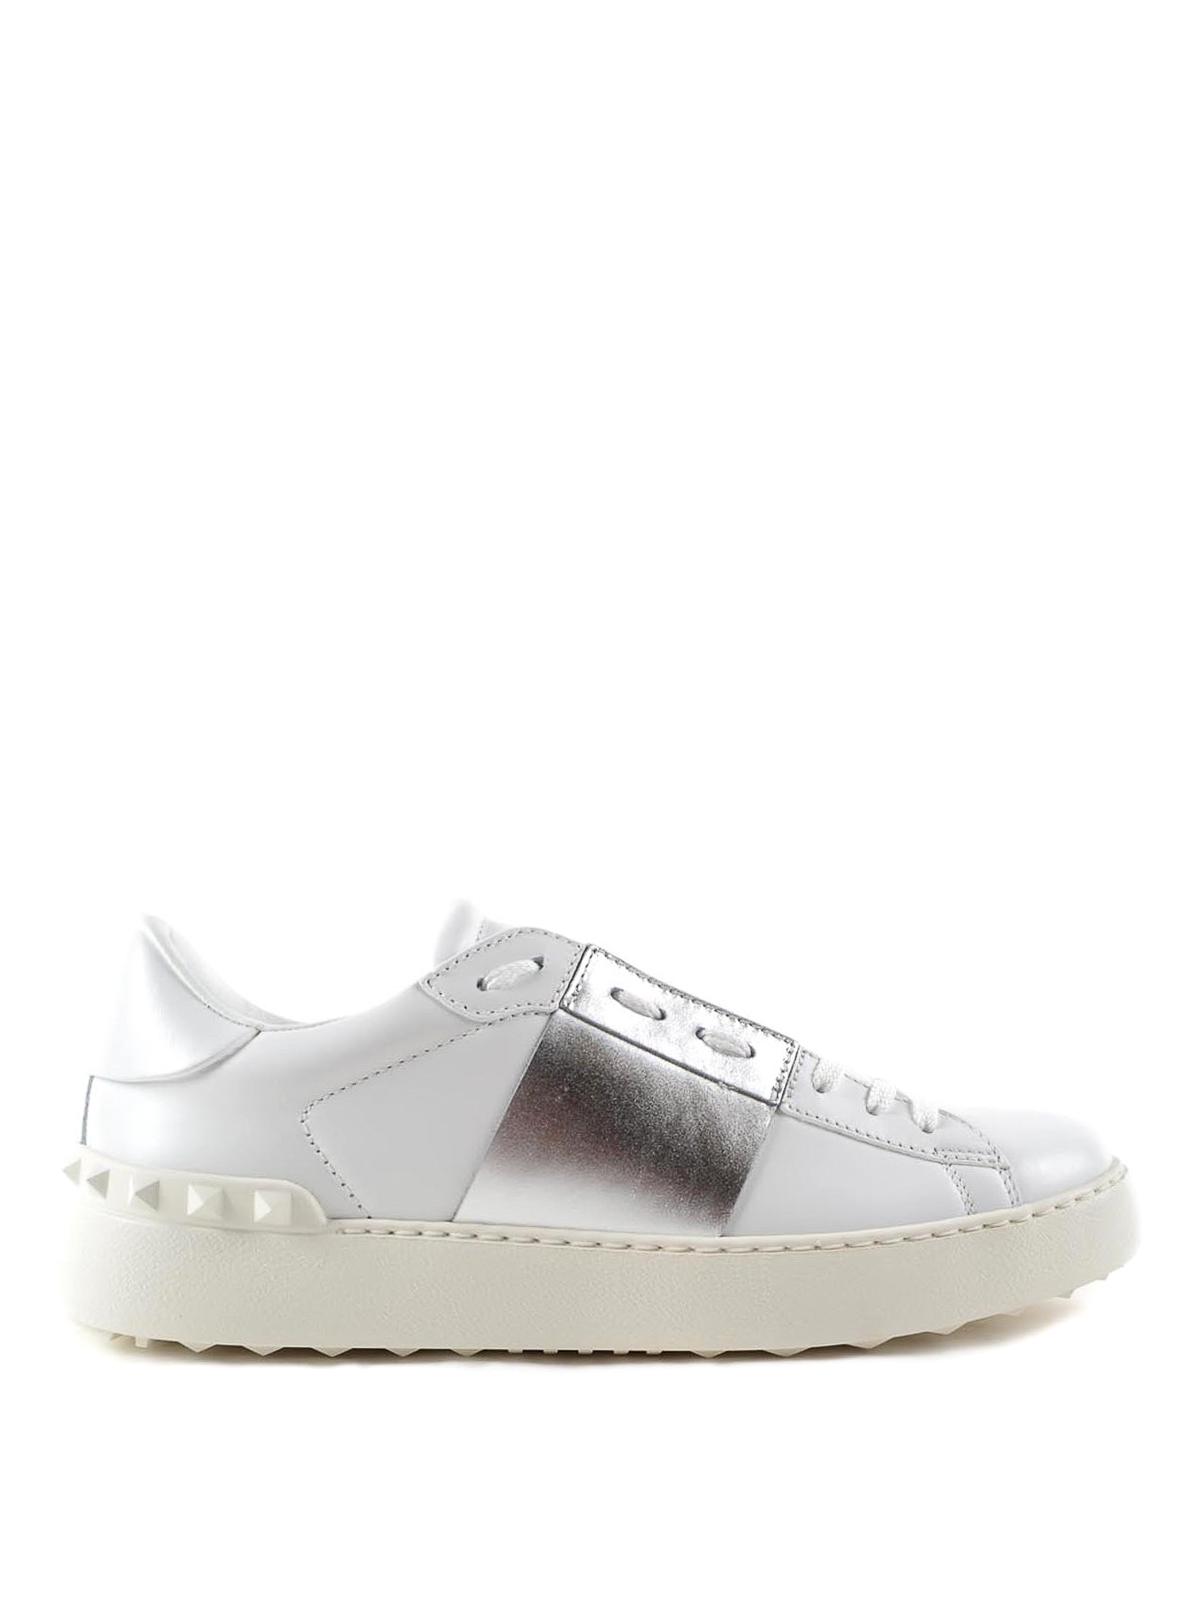 Open sneakers leather 857 Valentino trainers PW2S0781FLR Garavani g6IYmbfyv7